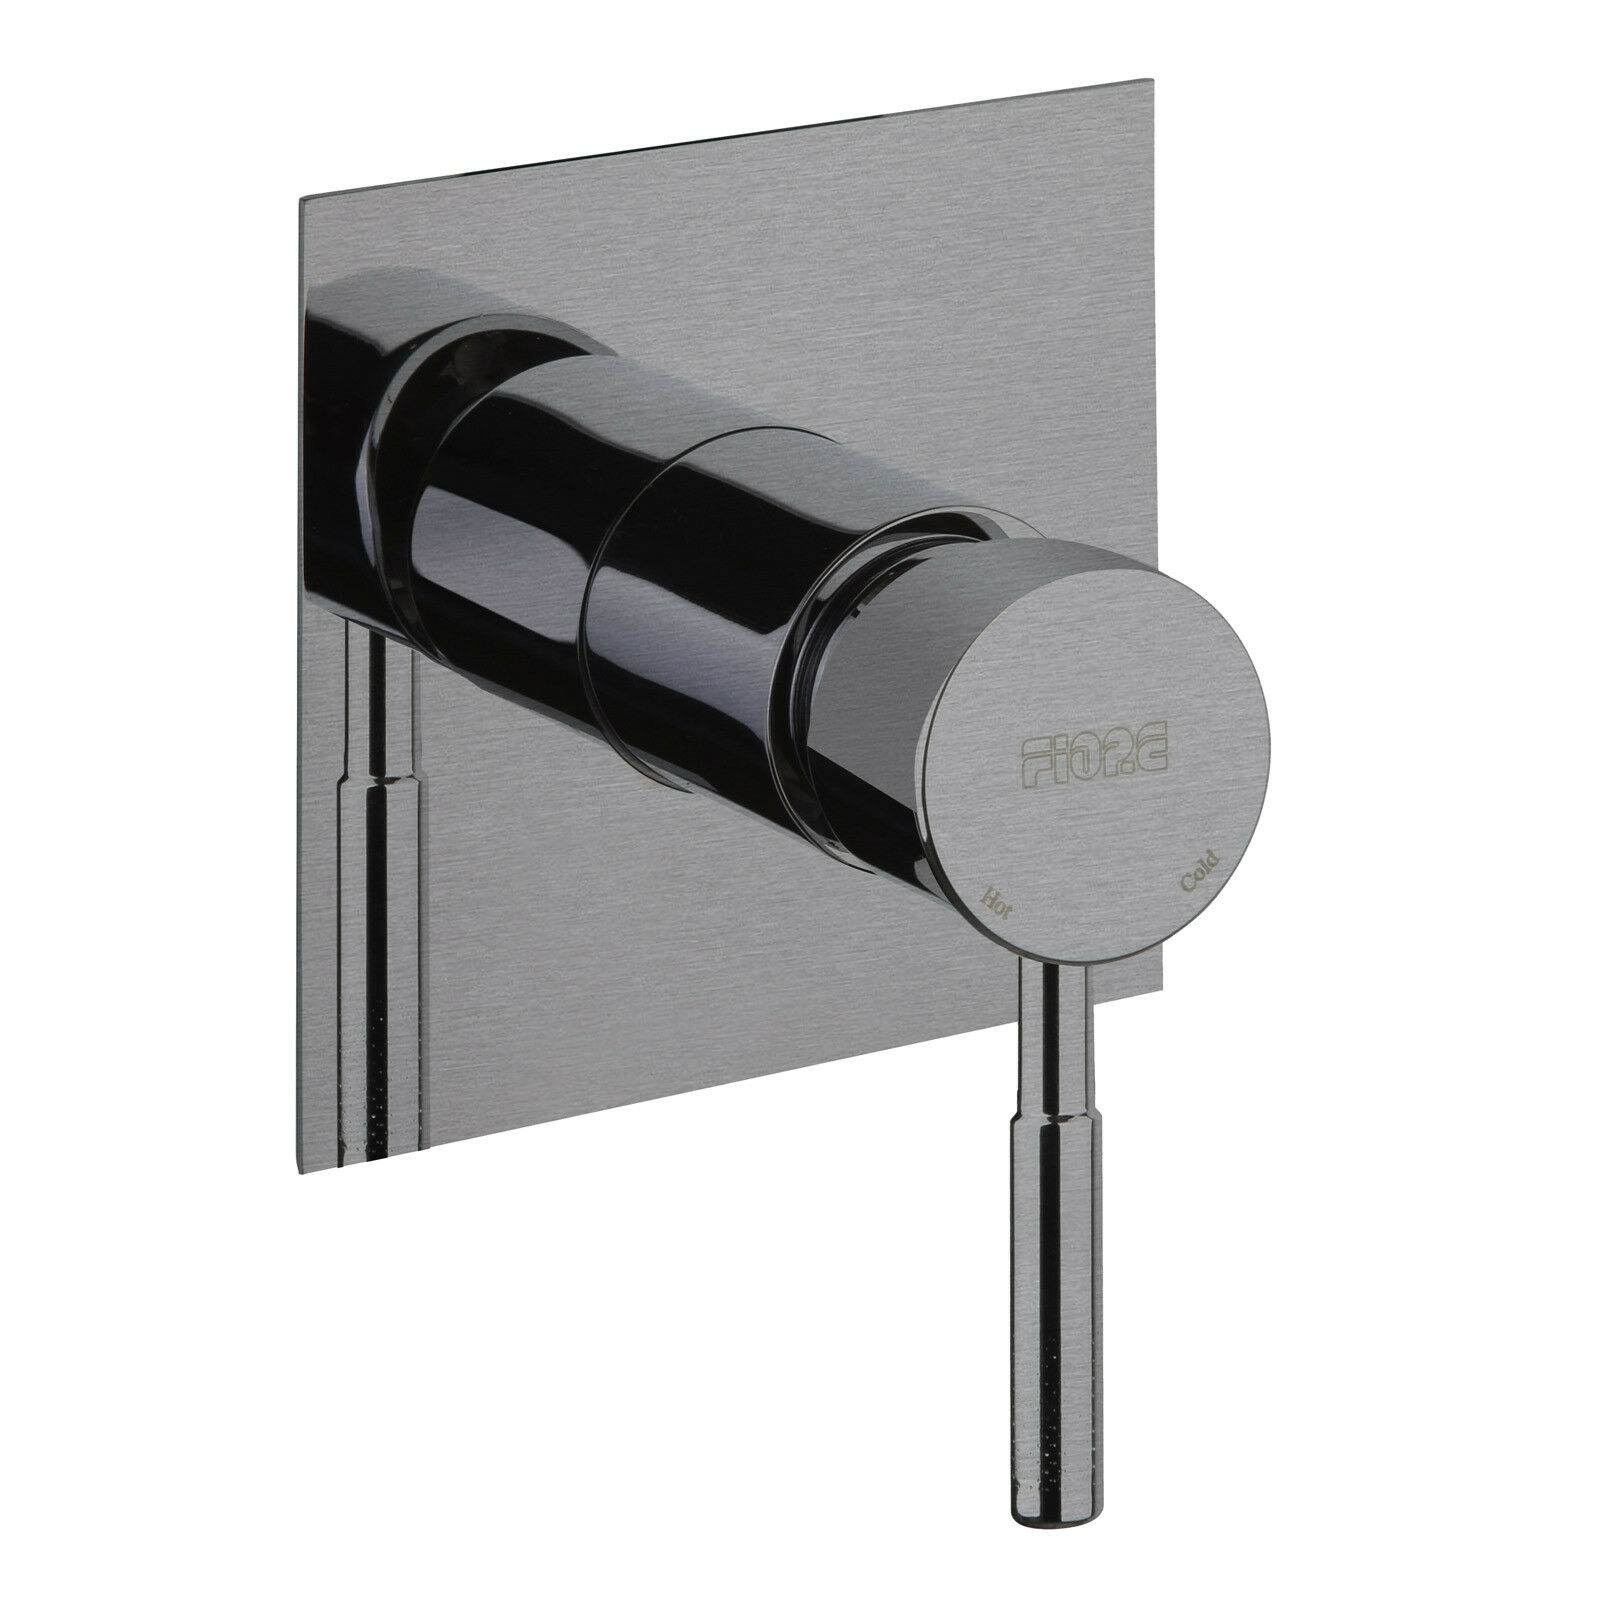 Miscelatore doccia a incasso design contemporaneo in acciaio inox